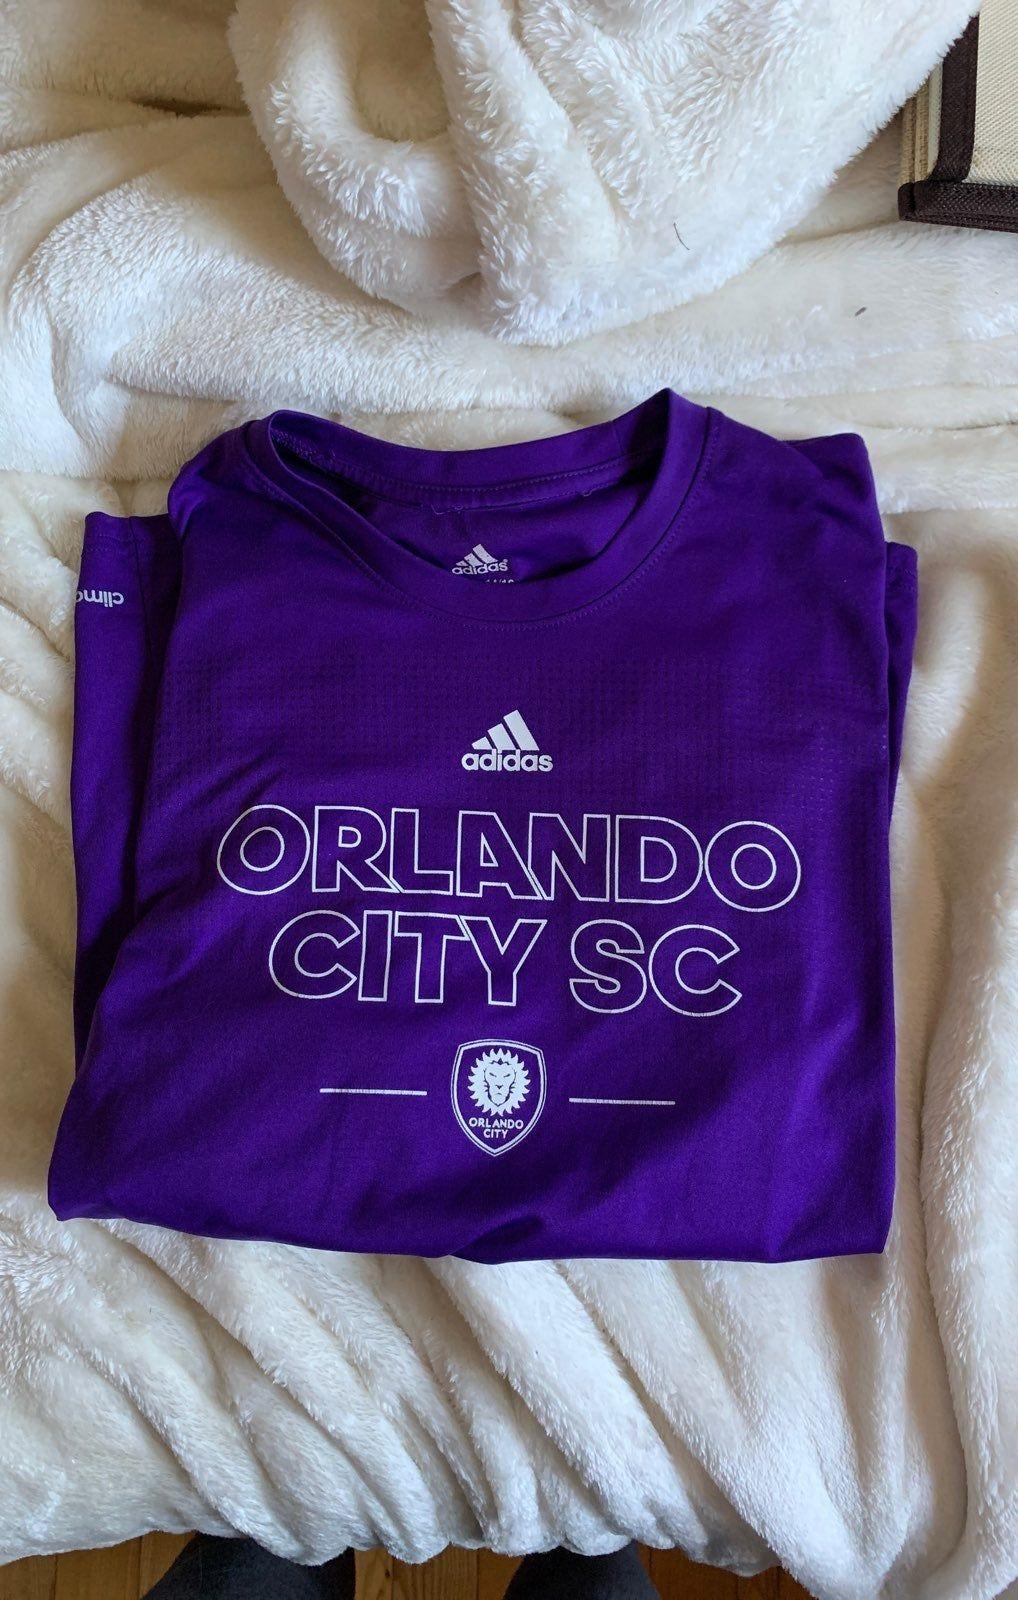 Adidas T Shirt Large Purple Shirts Sweatshirts T Shirt [ 1600 x 1018 Pixel ]